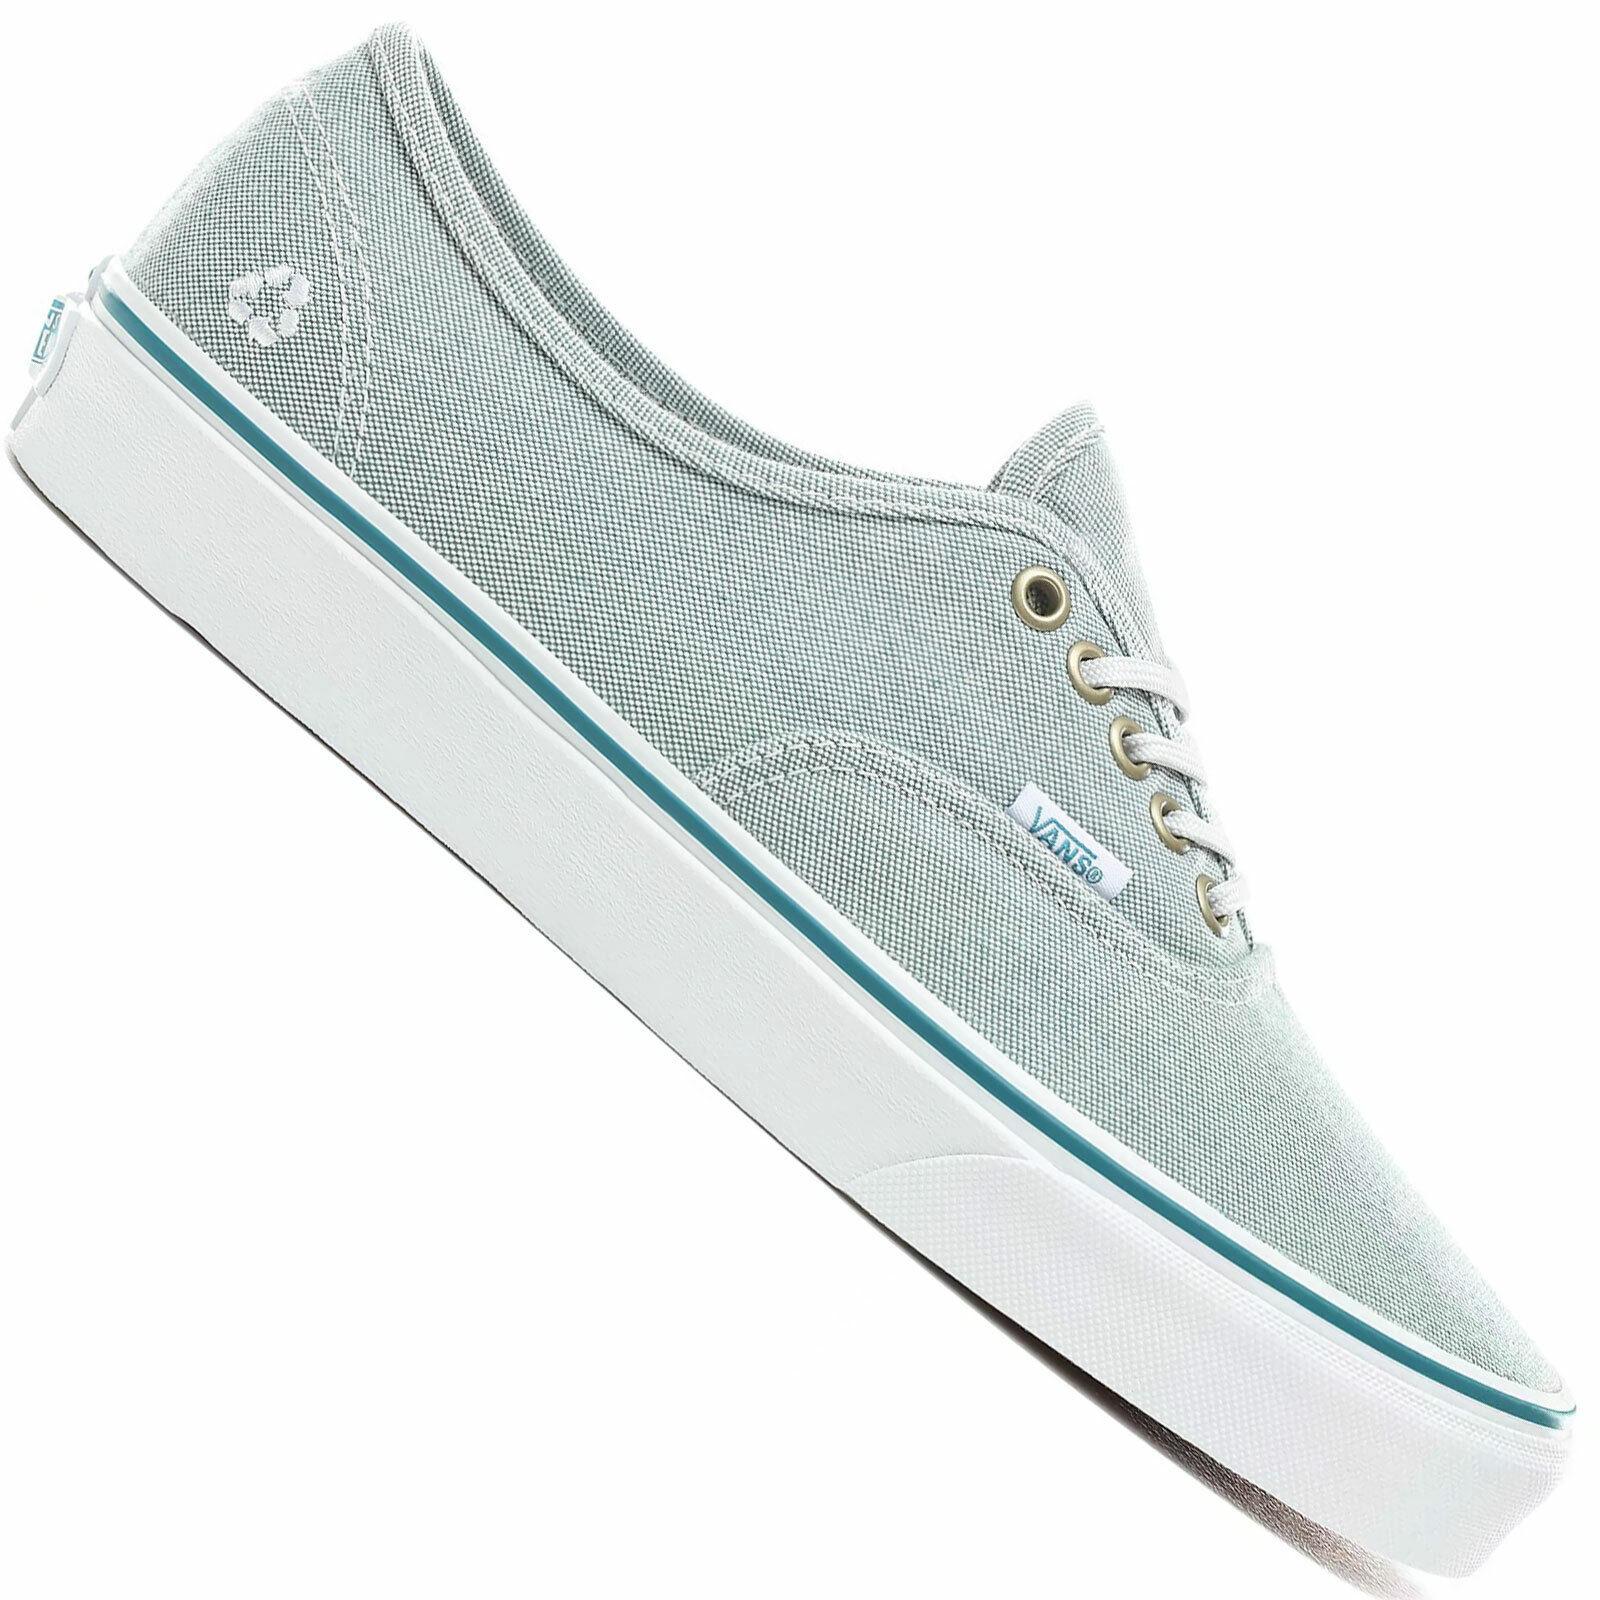 Vans Authentic Sneaker da Uomo Scarpe Basse Scarpe da Ginnastica Scarpe